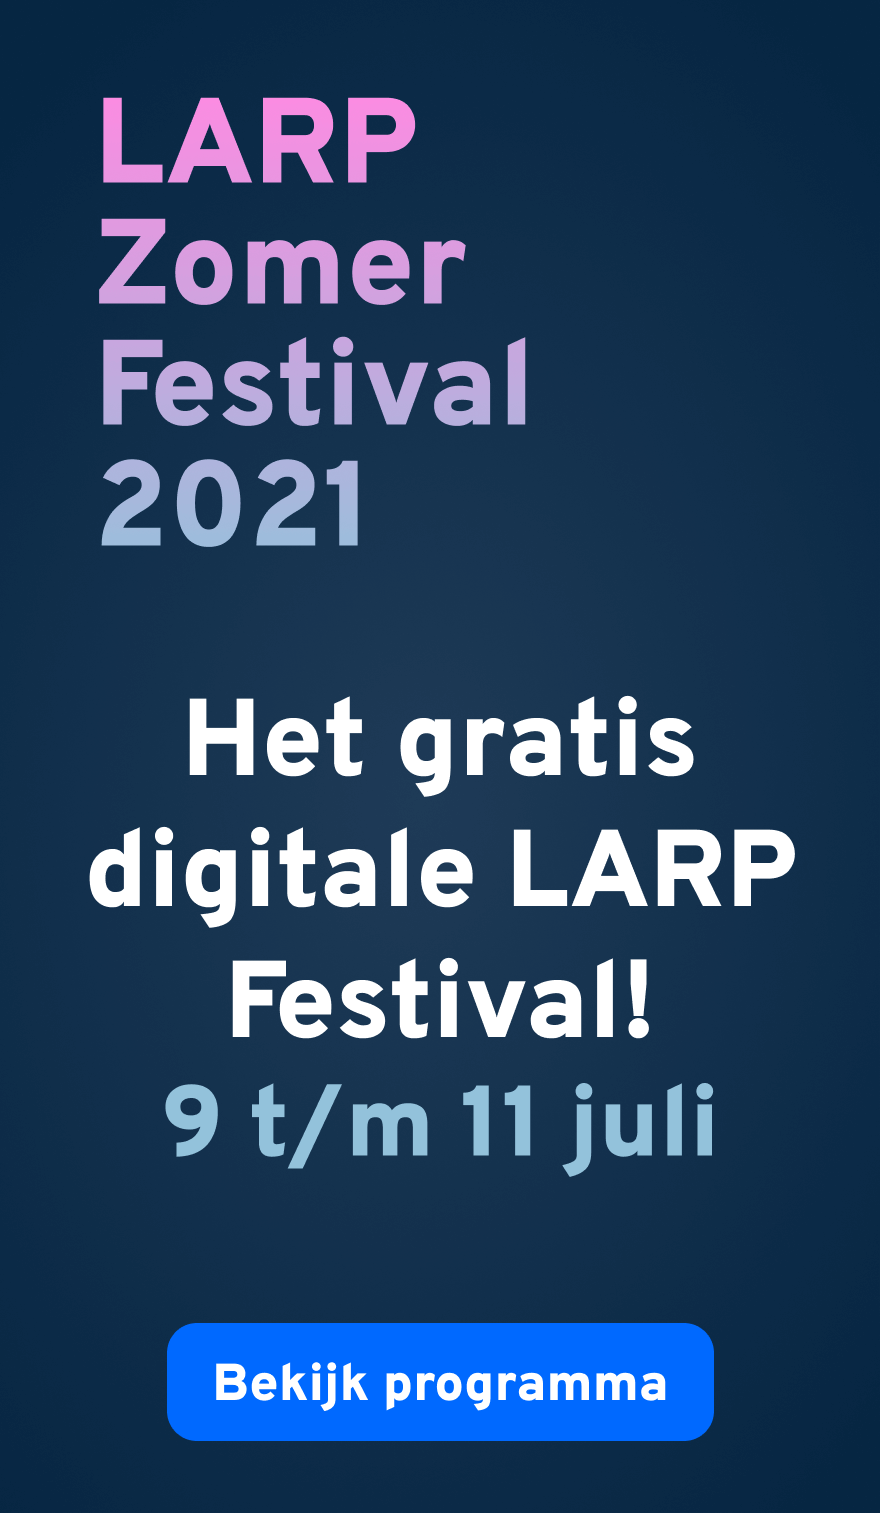 LARP Zomer Festival 2021